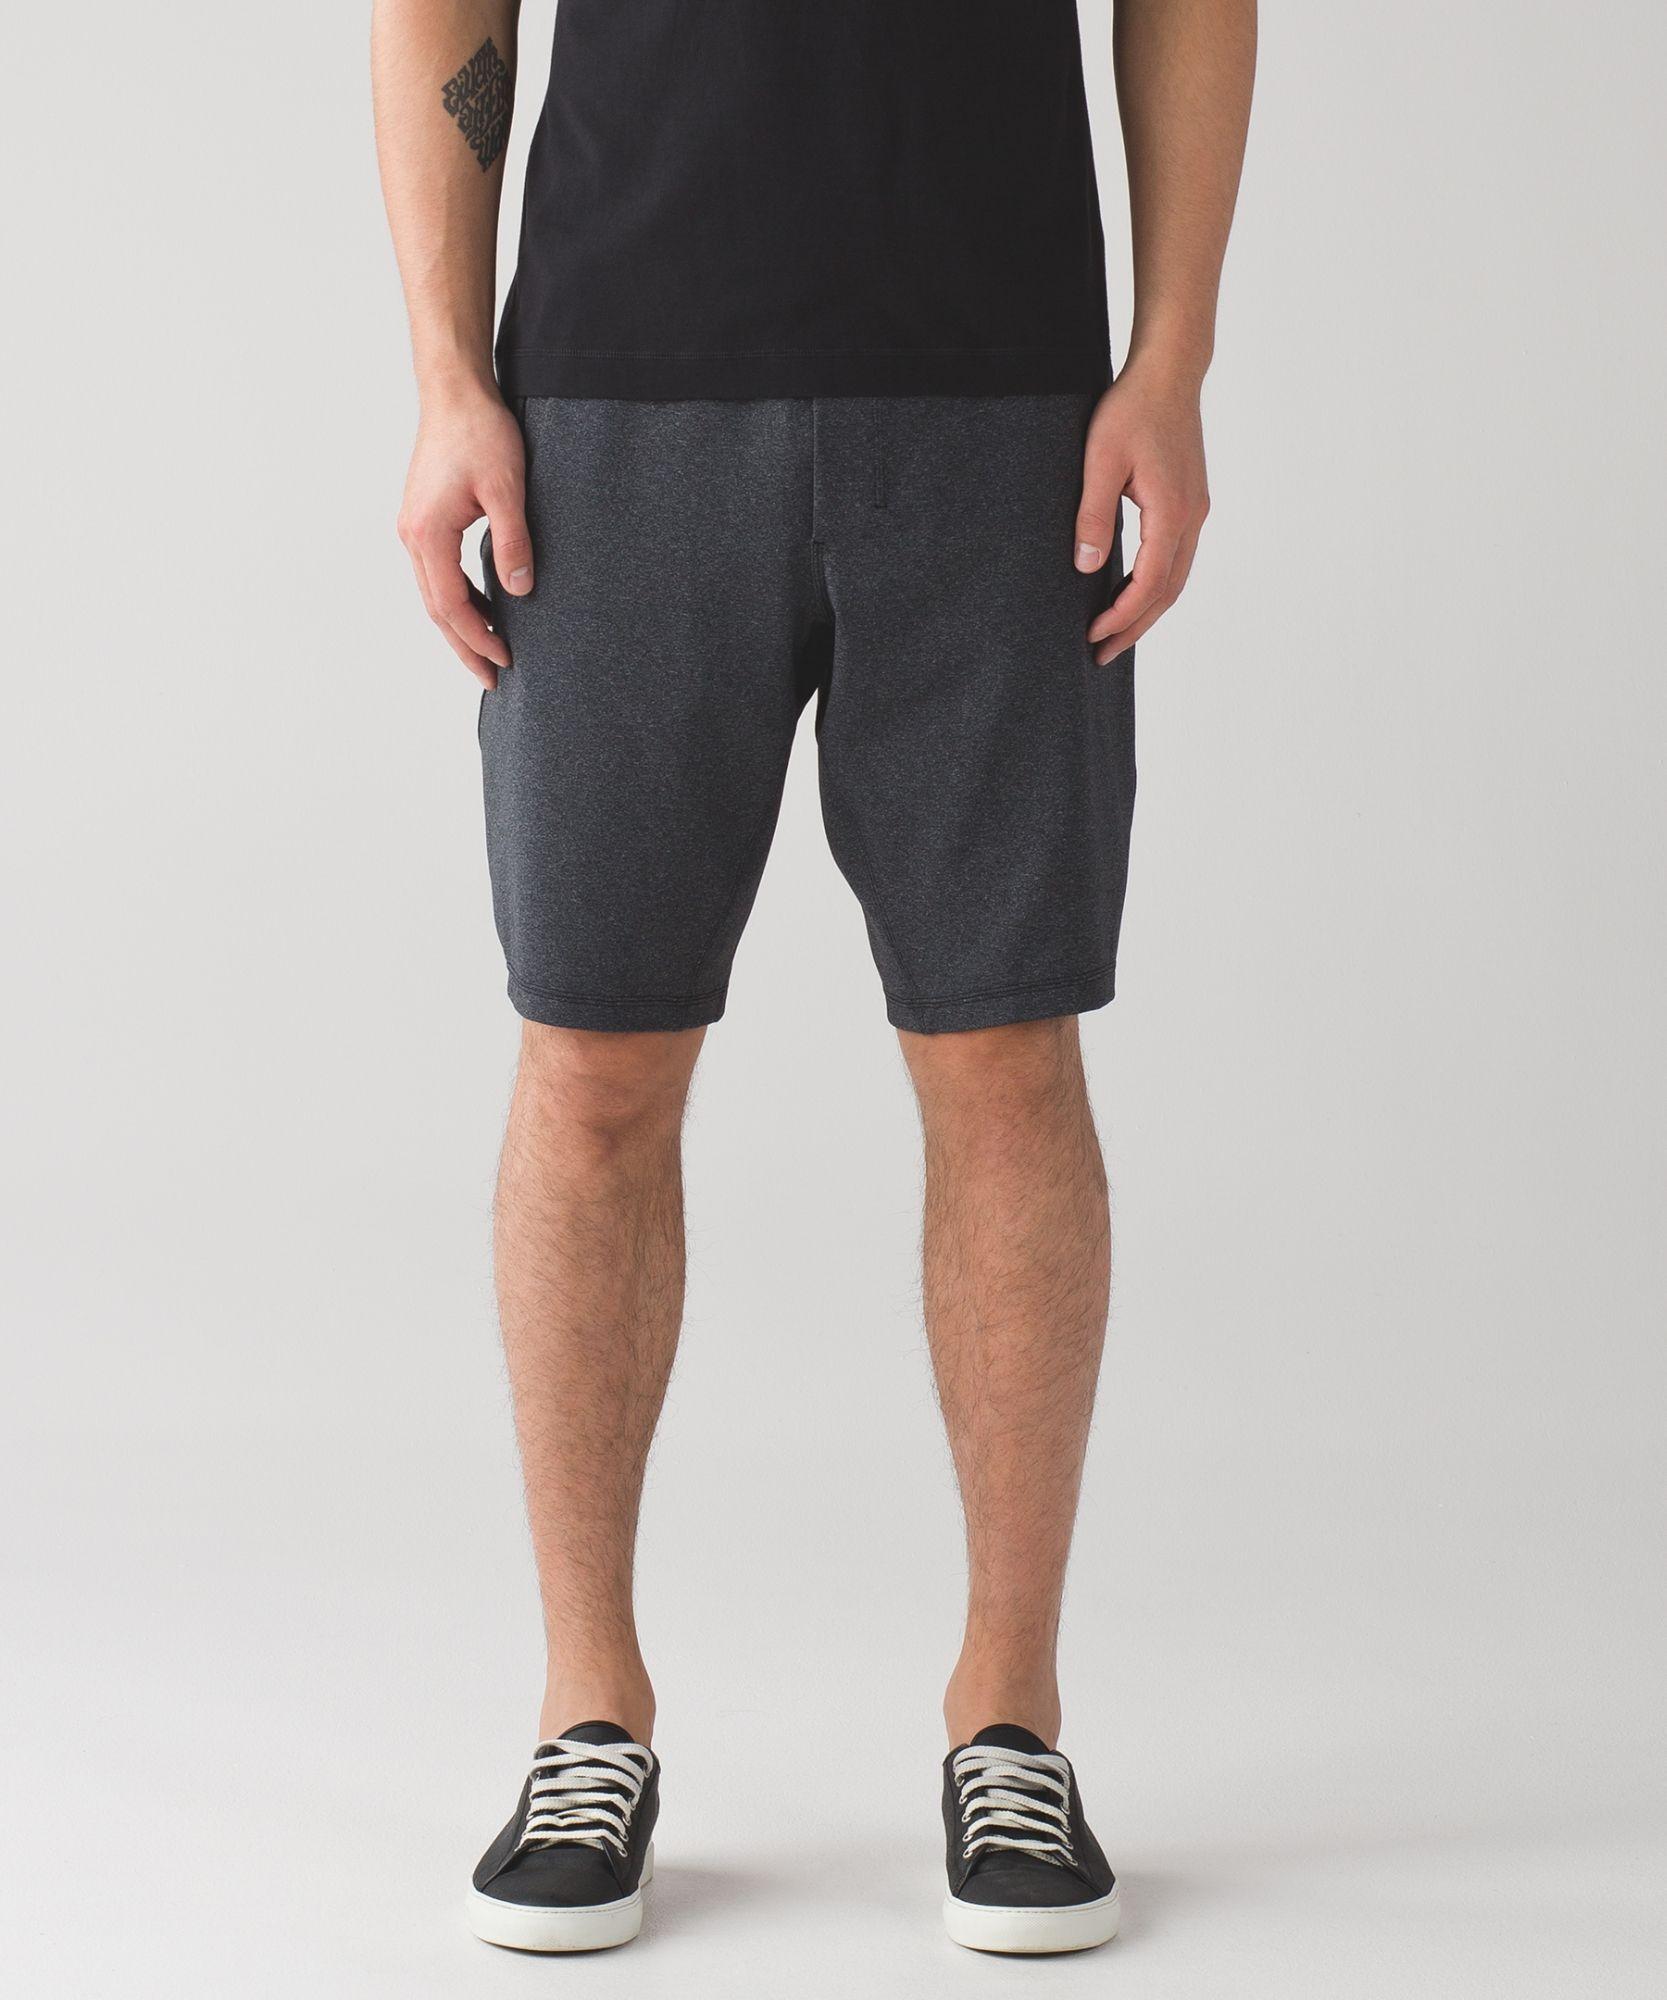 Men's Workout Shorts - Intent Short 11